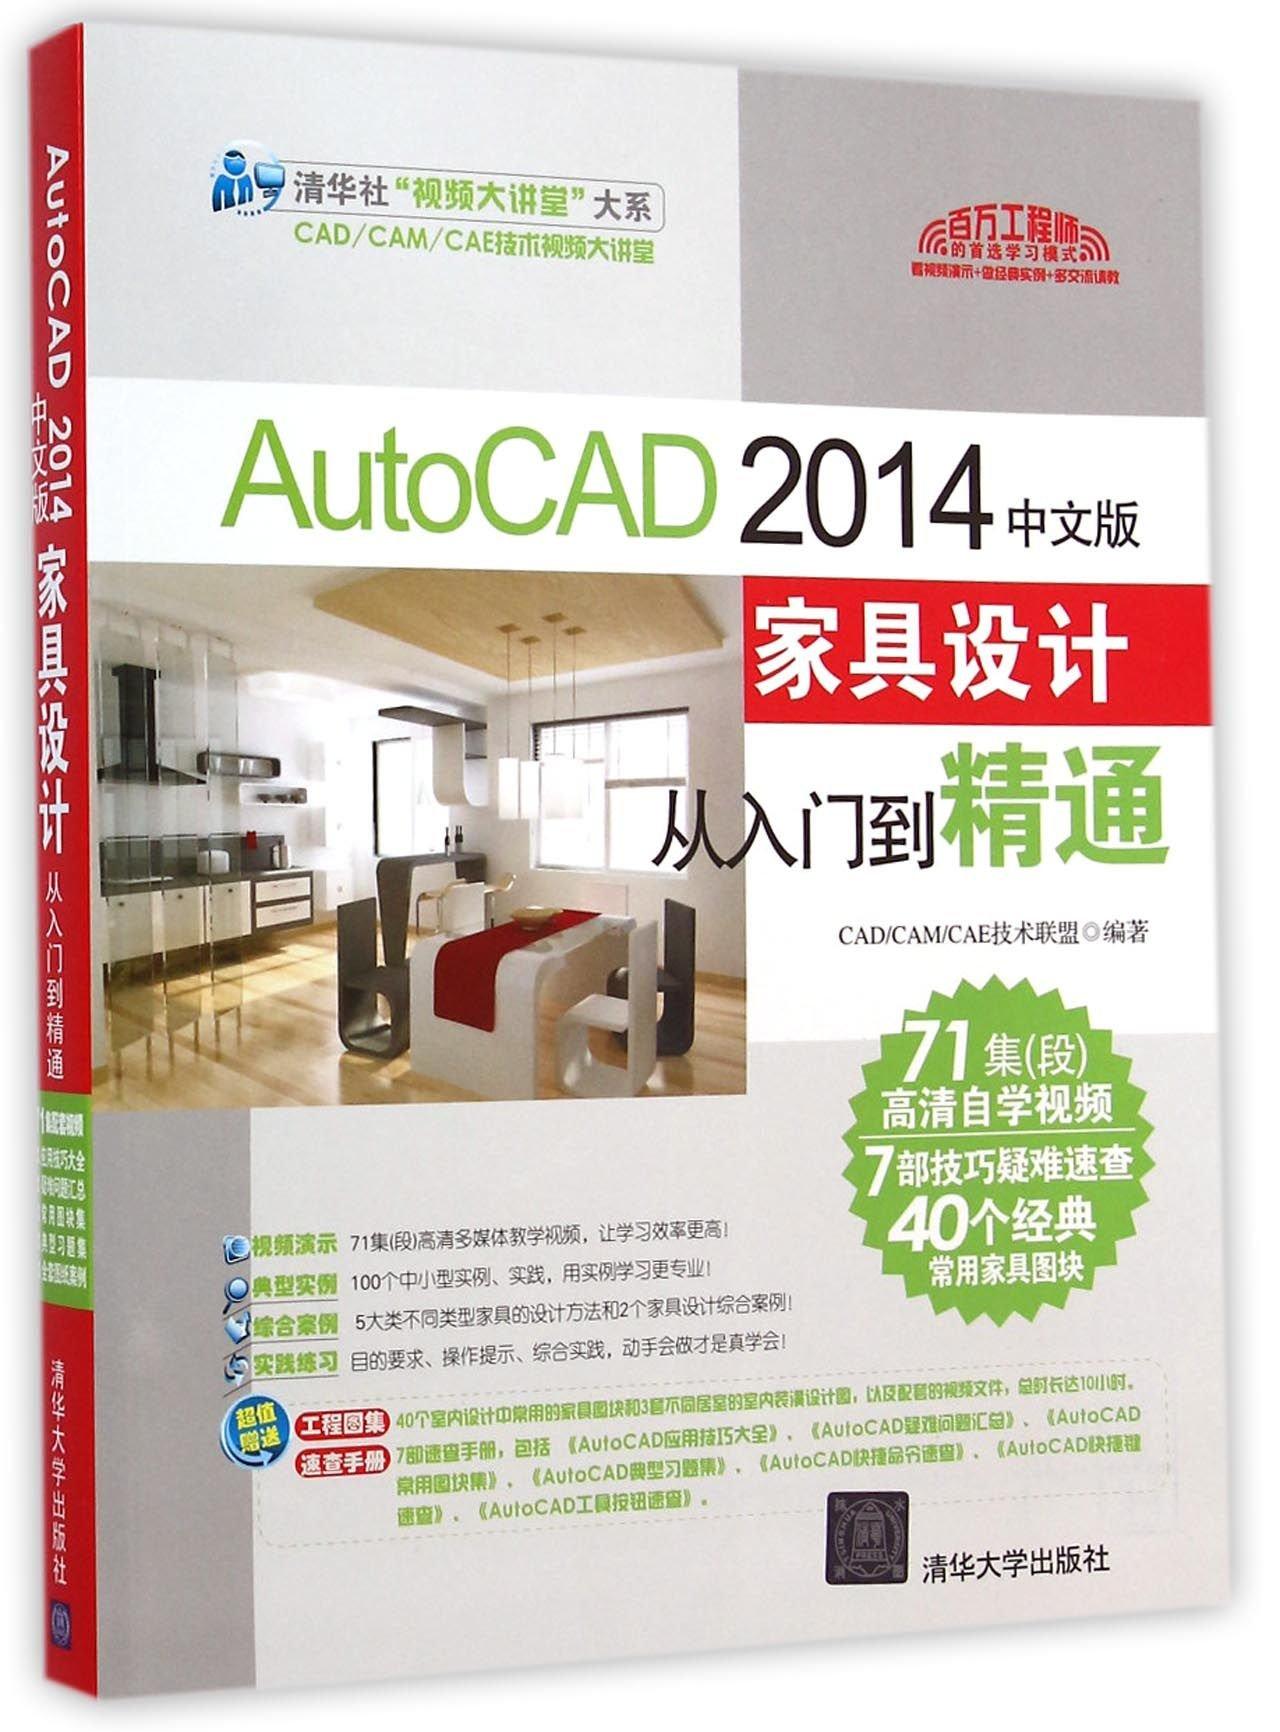 AutoCAD2014中文版家具设计从入门到精通(配光盘)